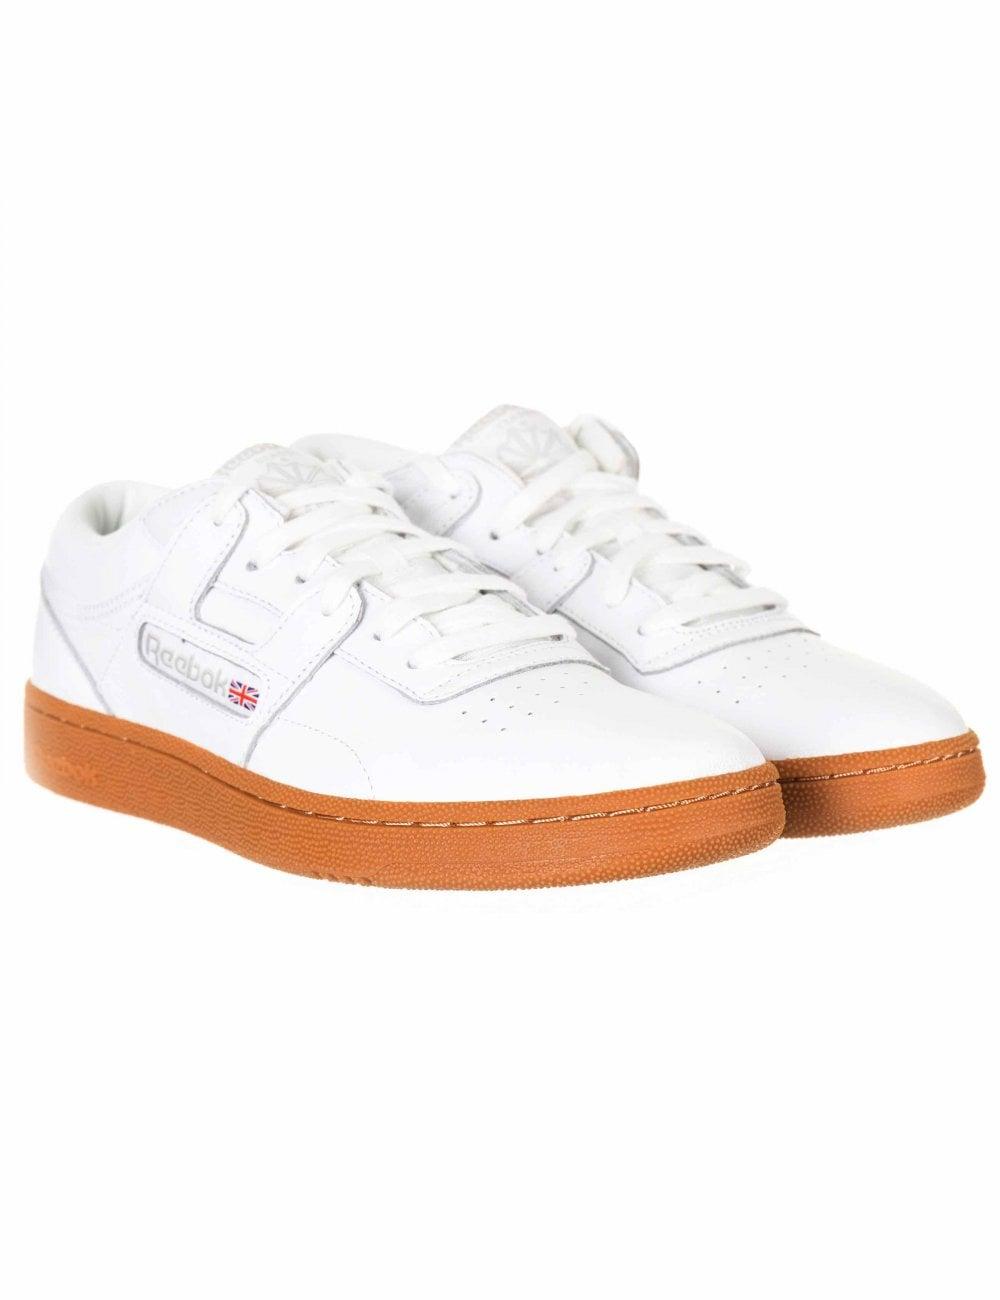 c75f521badade Reebok Club Workout MU Trainers - White Skull Grey - Footwear from ...